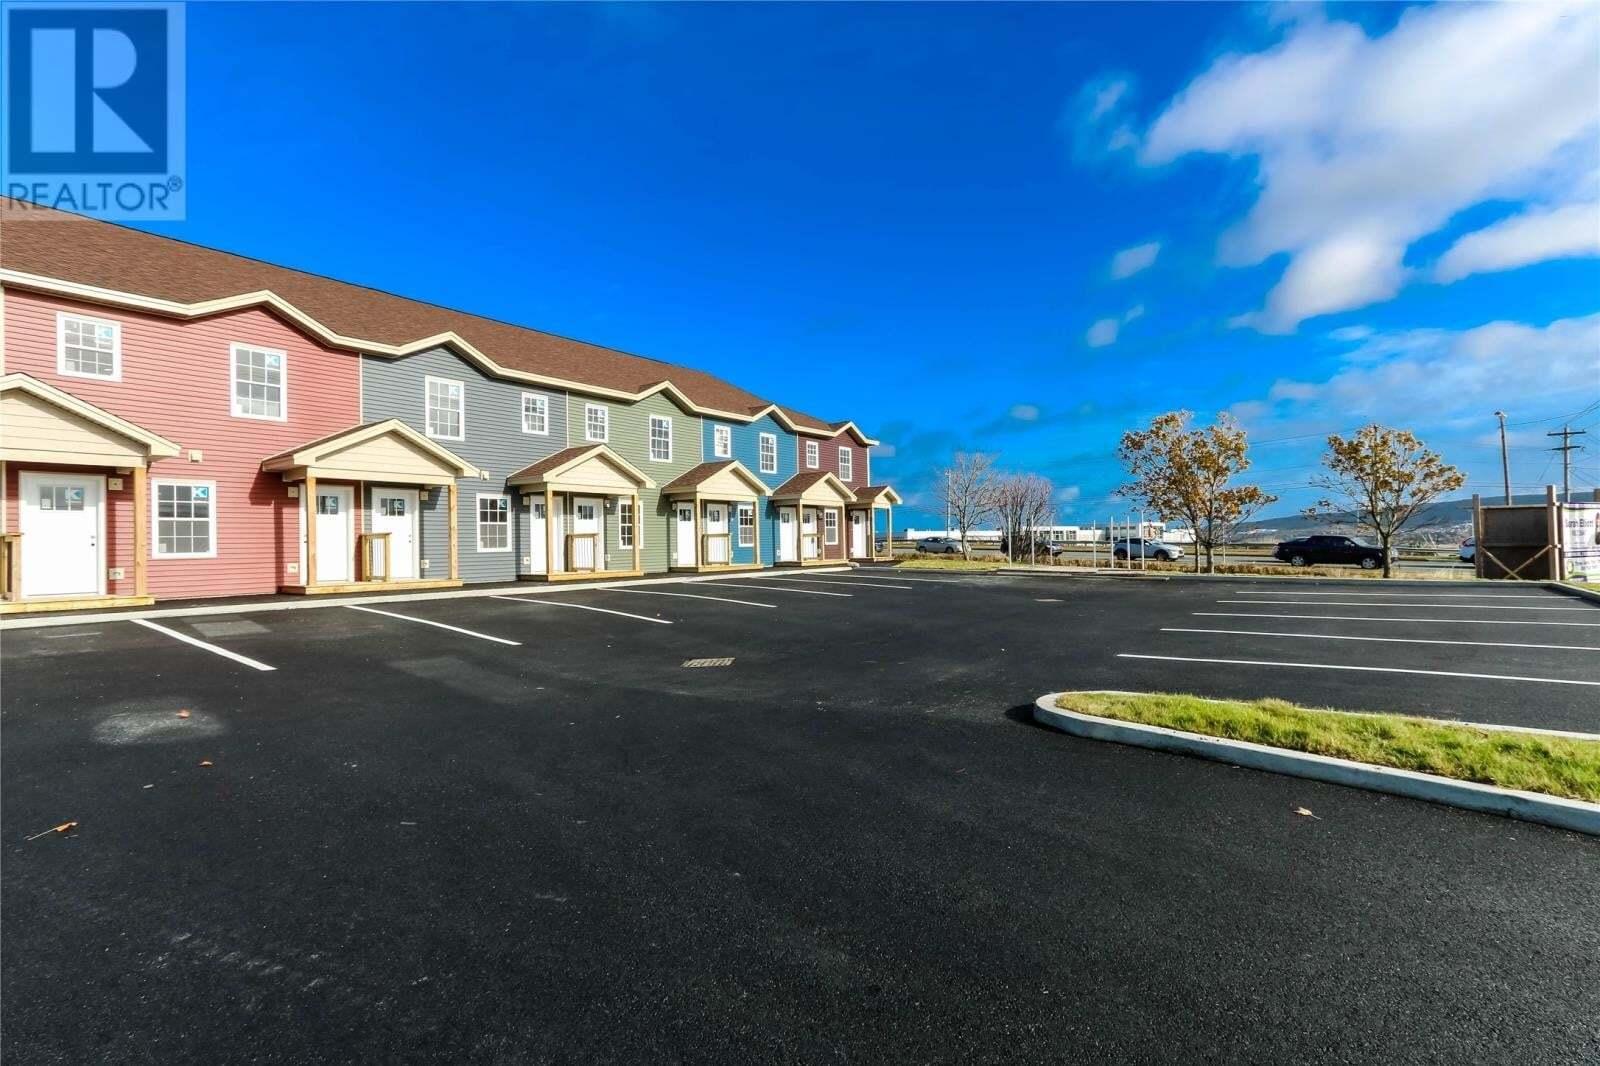 House for sale at 280 Blackmarsh Rd St. John's Newfoundland - MLS: 1221013